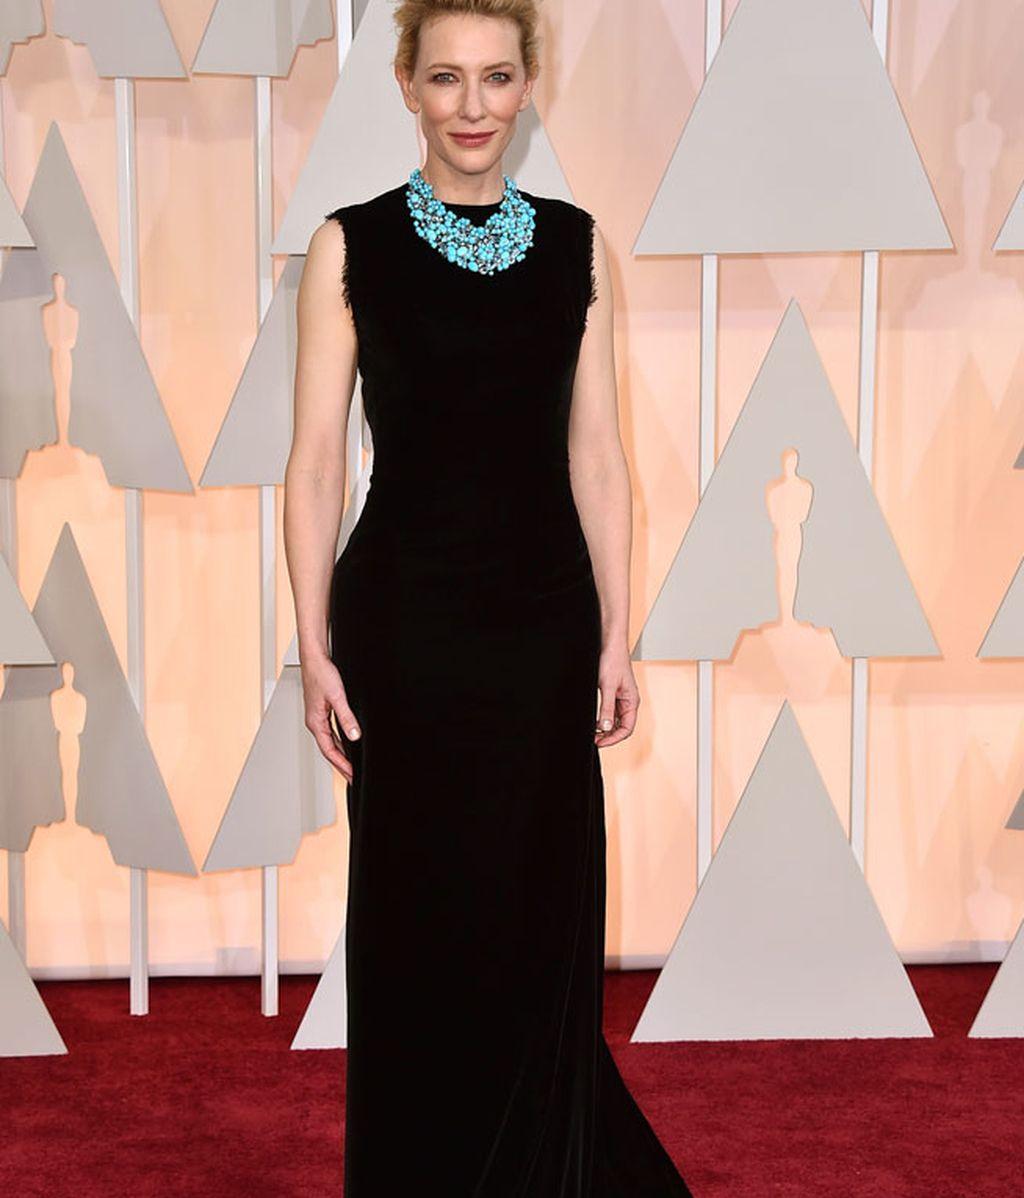 Cate Blanchett vestida de Maison Margiela Couture